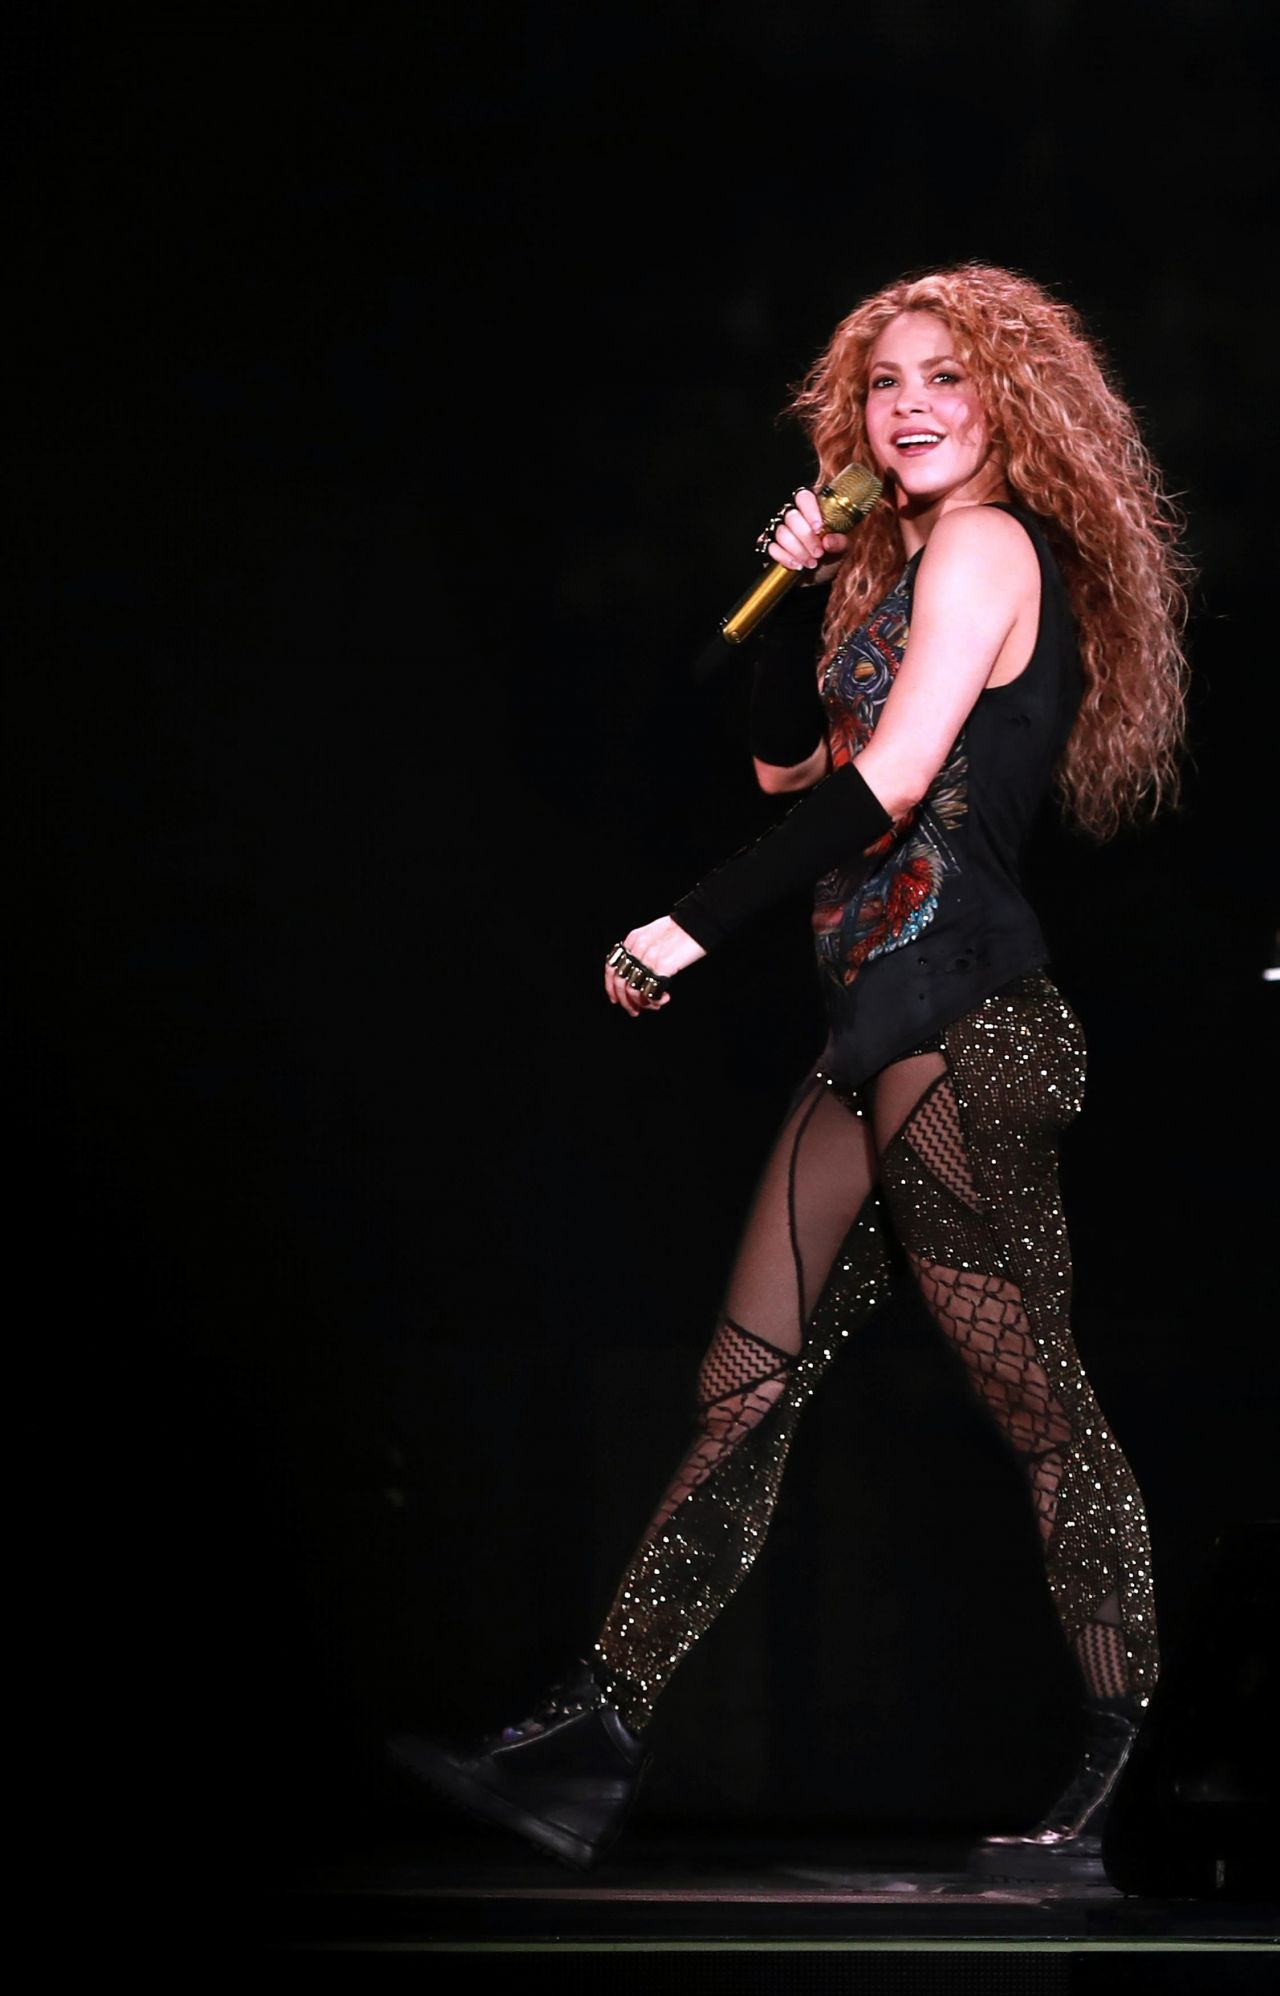 Shakira El Dorado Tour In Bordeaux 06 24 2018